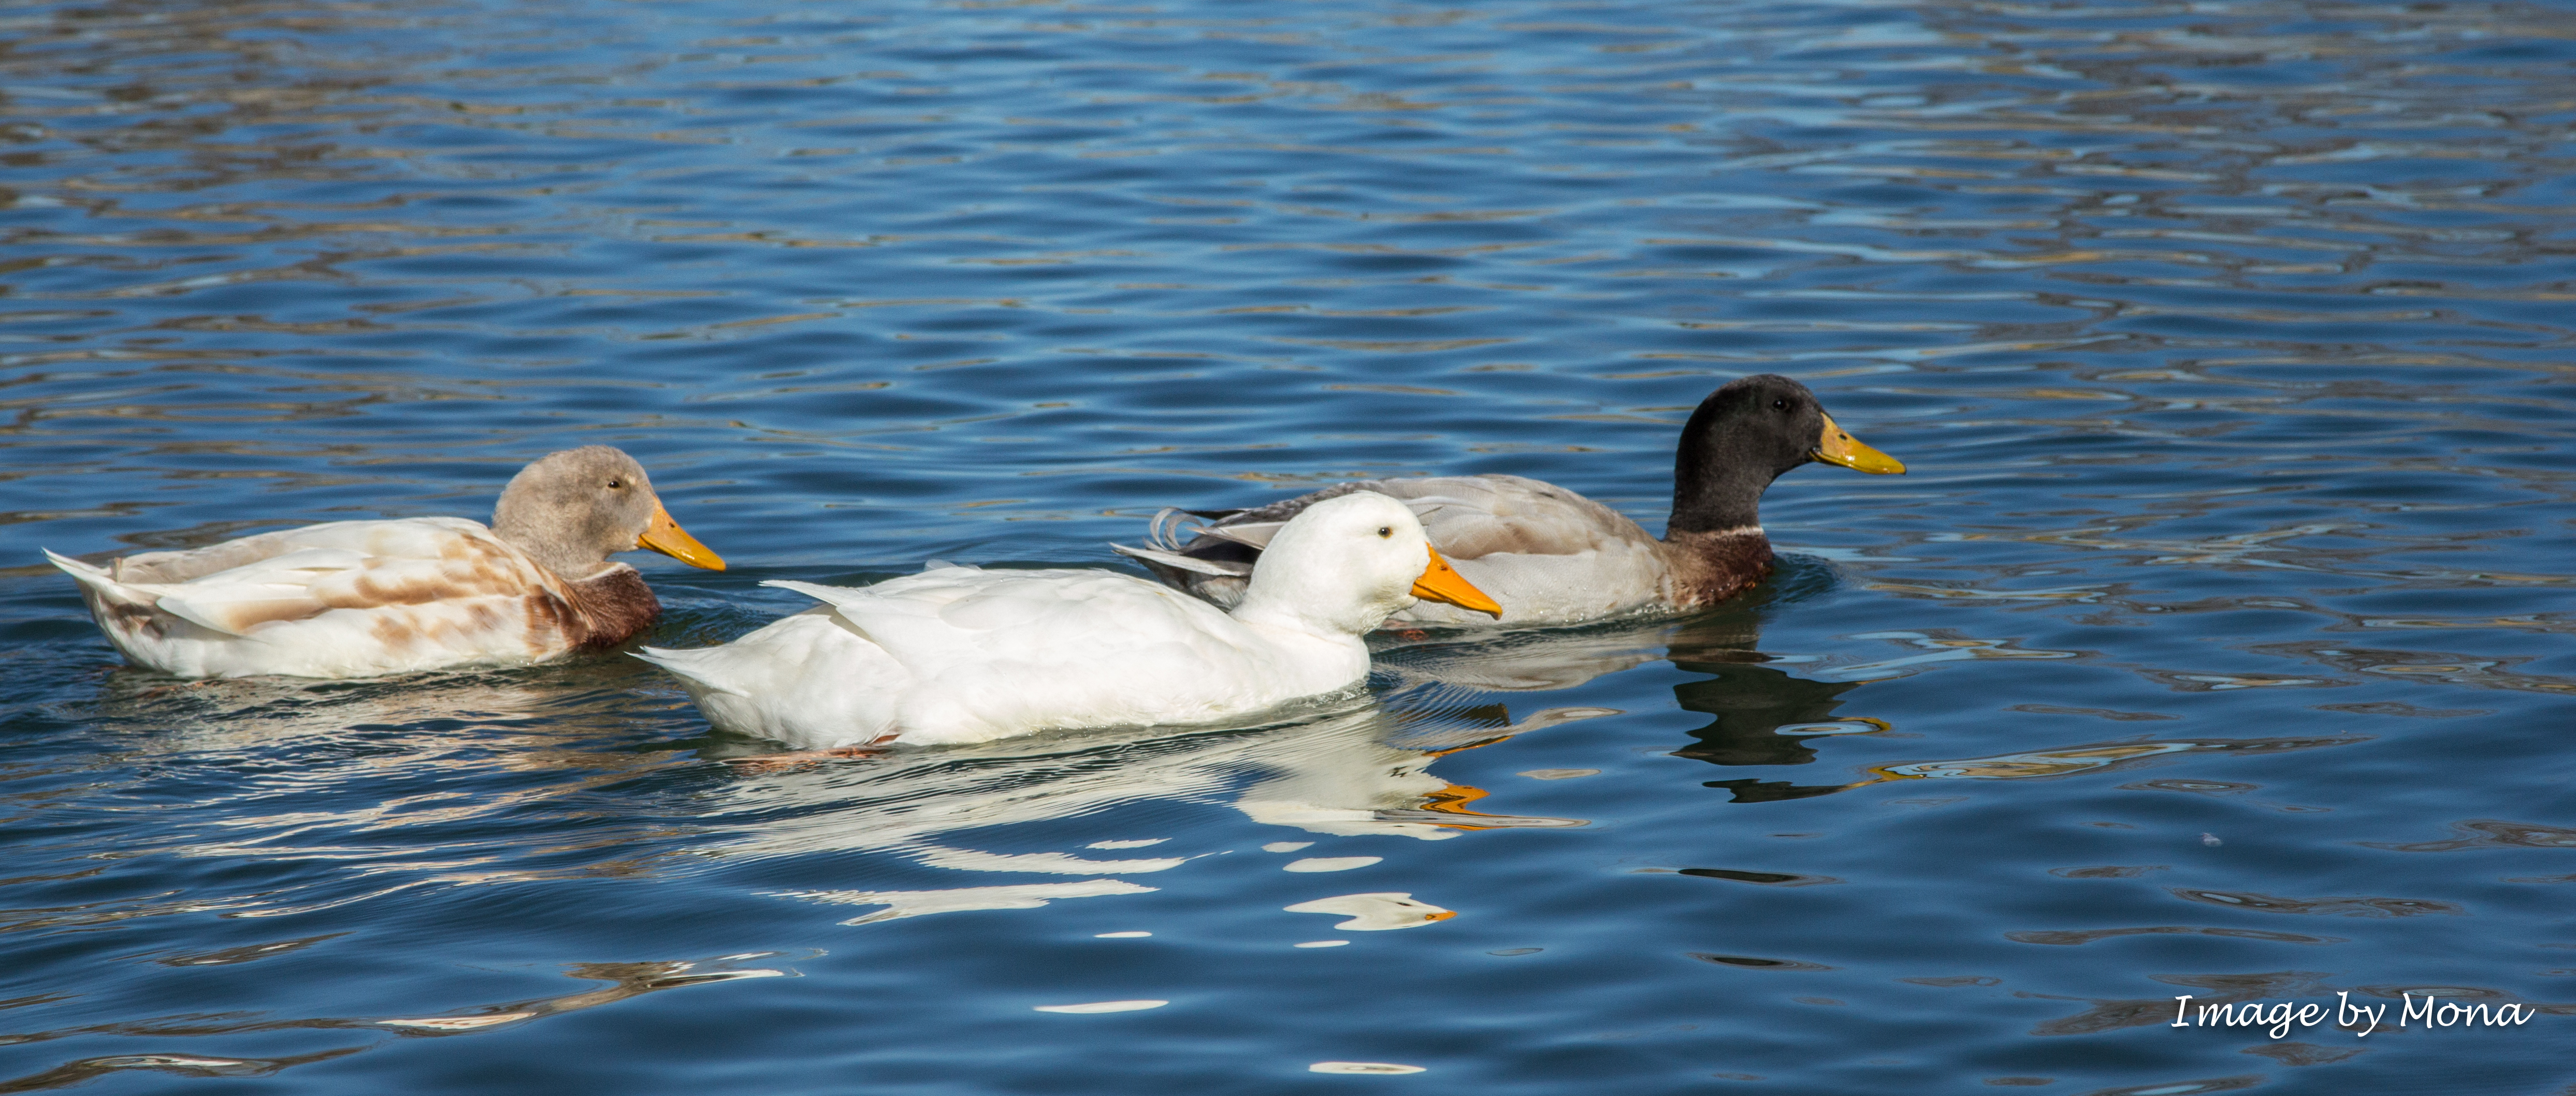 3 ducks photo